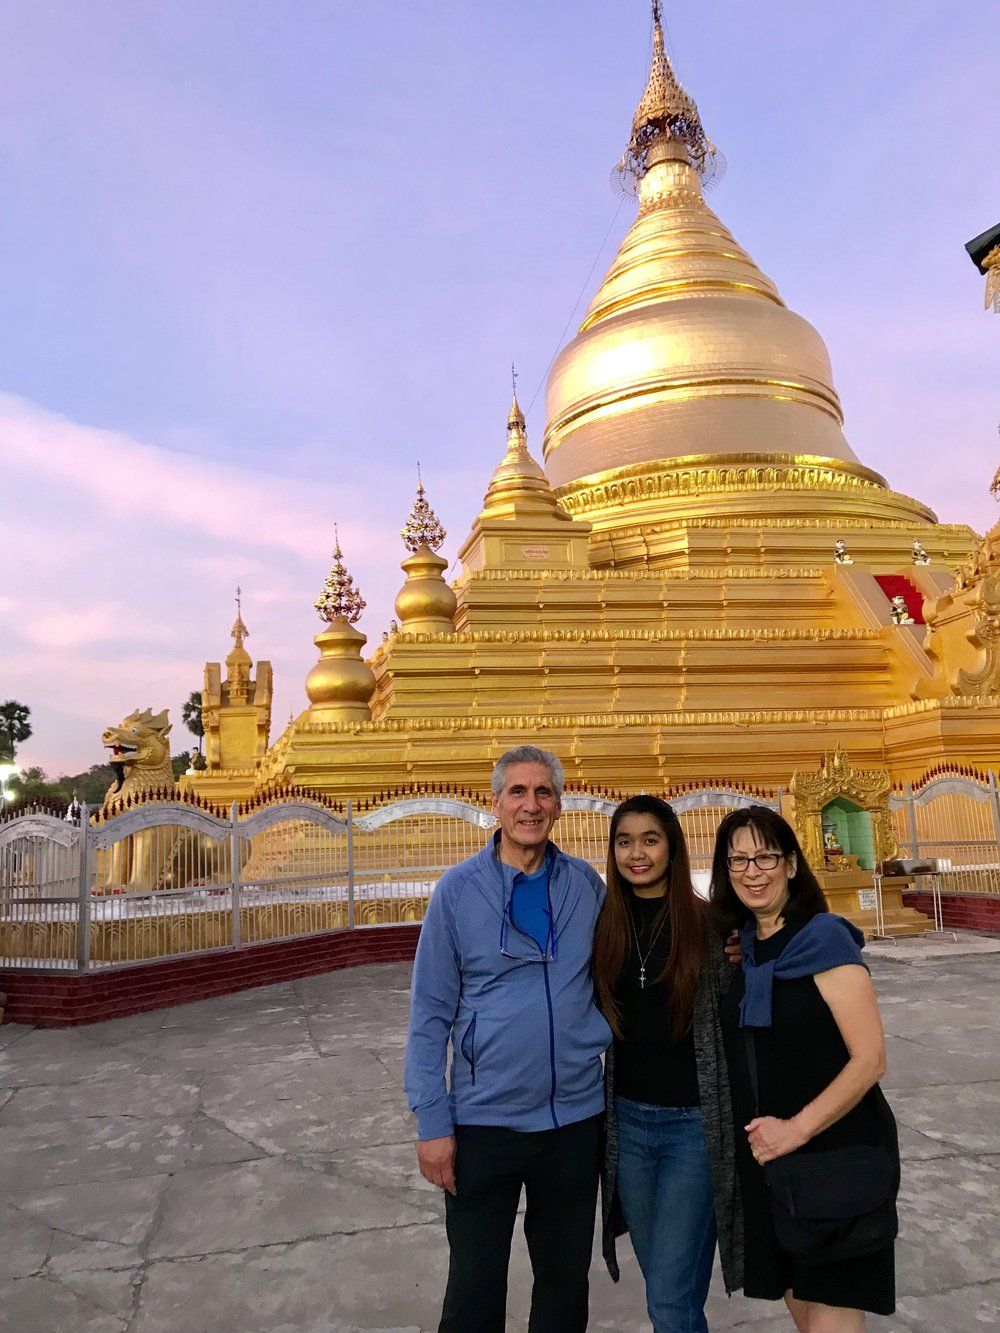 Michelle, Cecile & Me (golden pagoda).jpg*.jpg